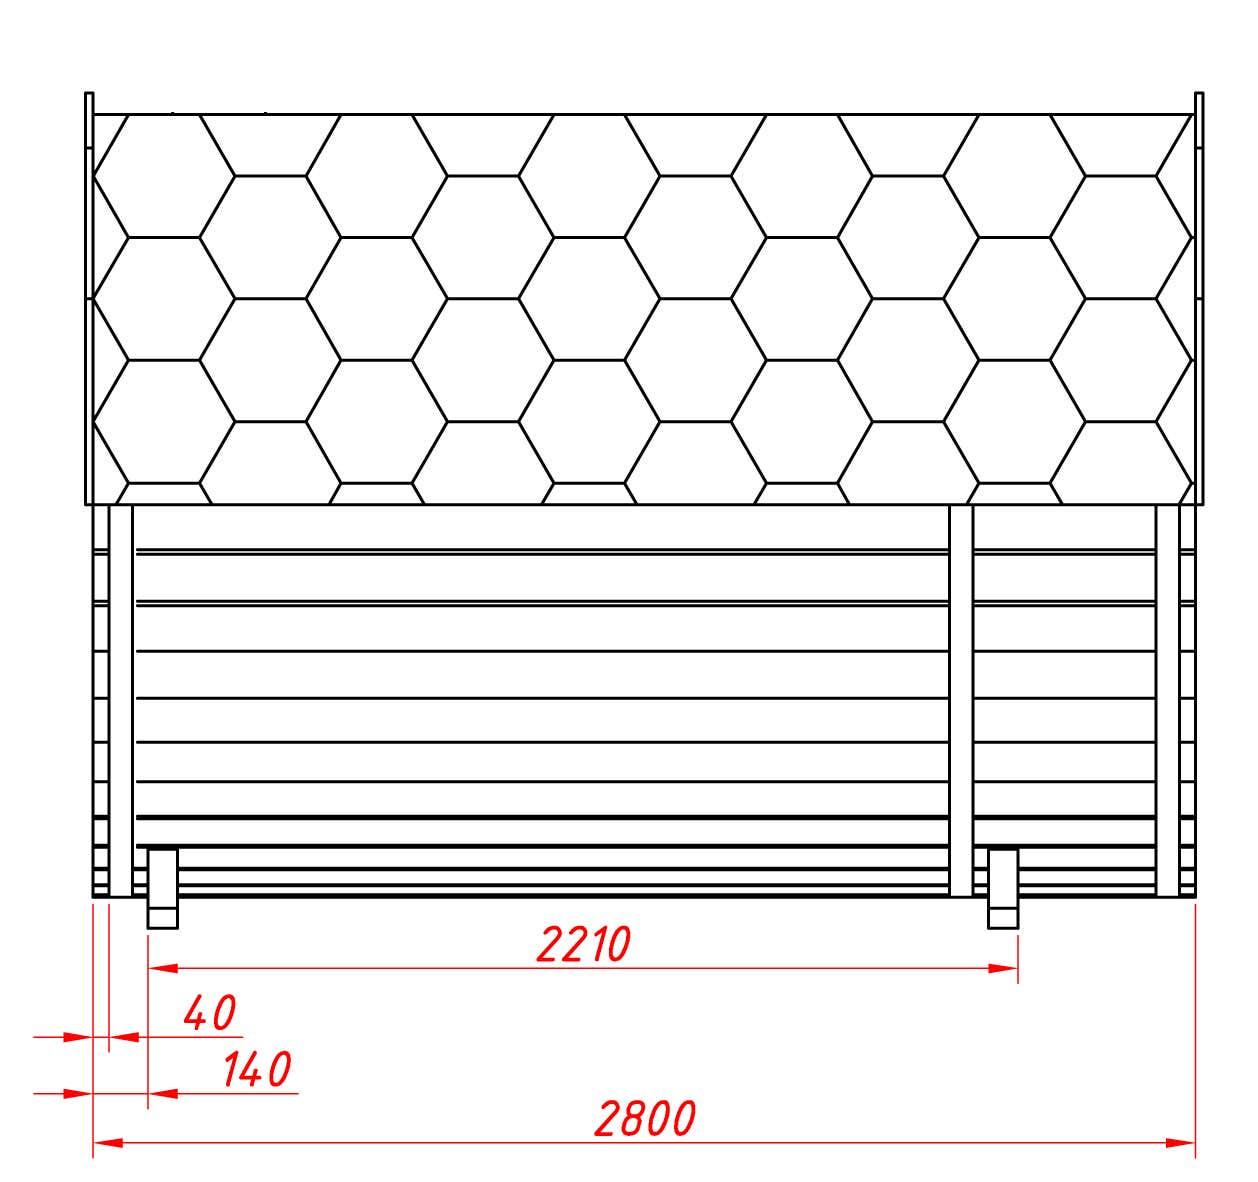 saunafass mit ofen thermoholz 2 raum fass sauna ole mit harvia holz ofen thermoholz fass sauna. Black Bedroom Furniture Sets. Home Design Ideas